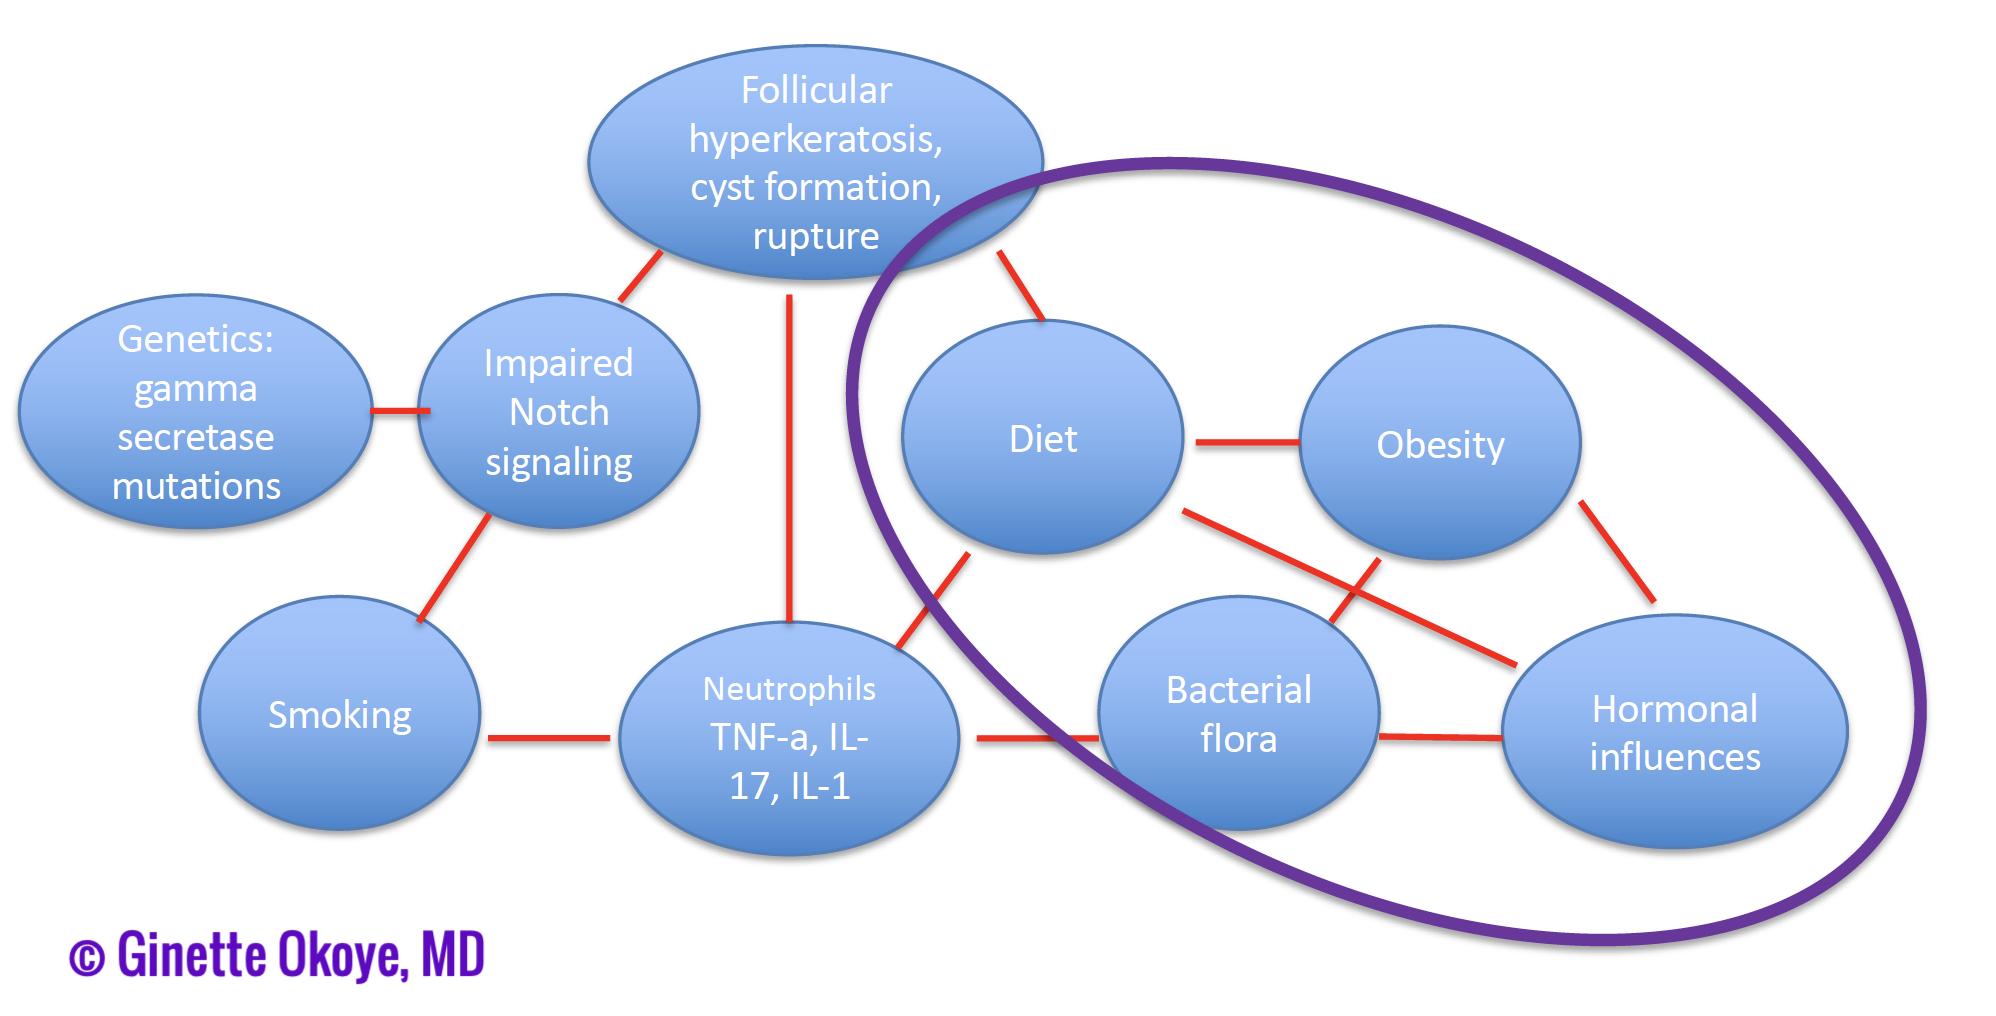 axillary-mammary-inguinal subtype of HS